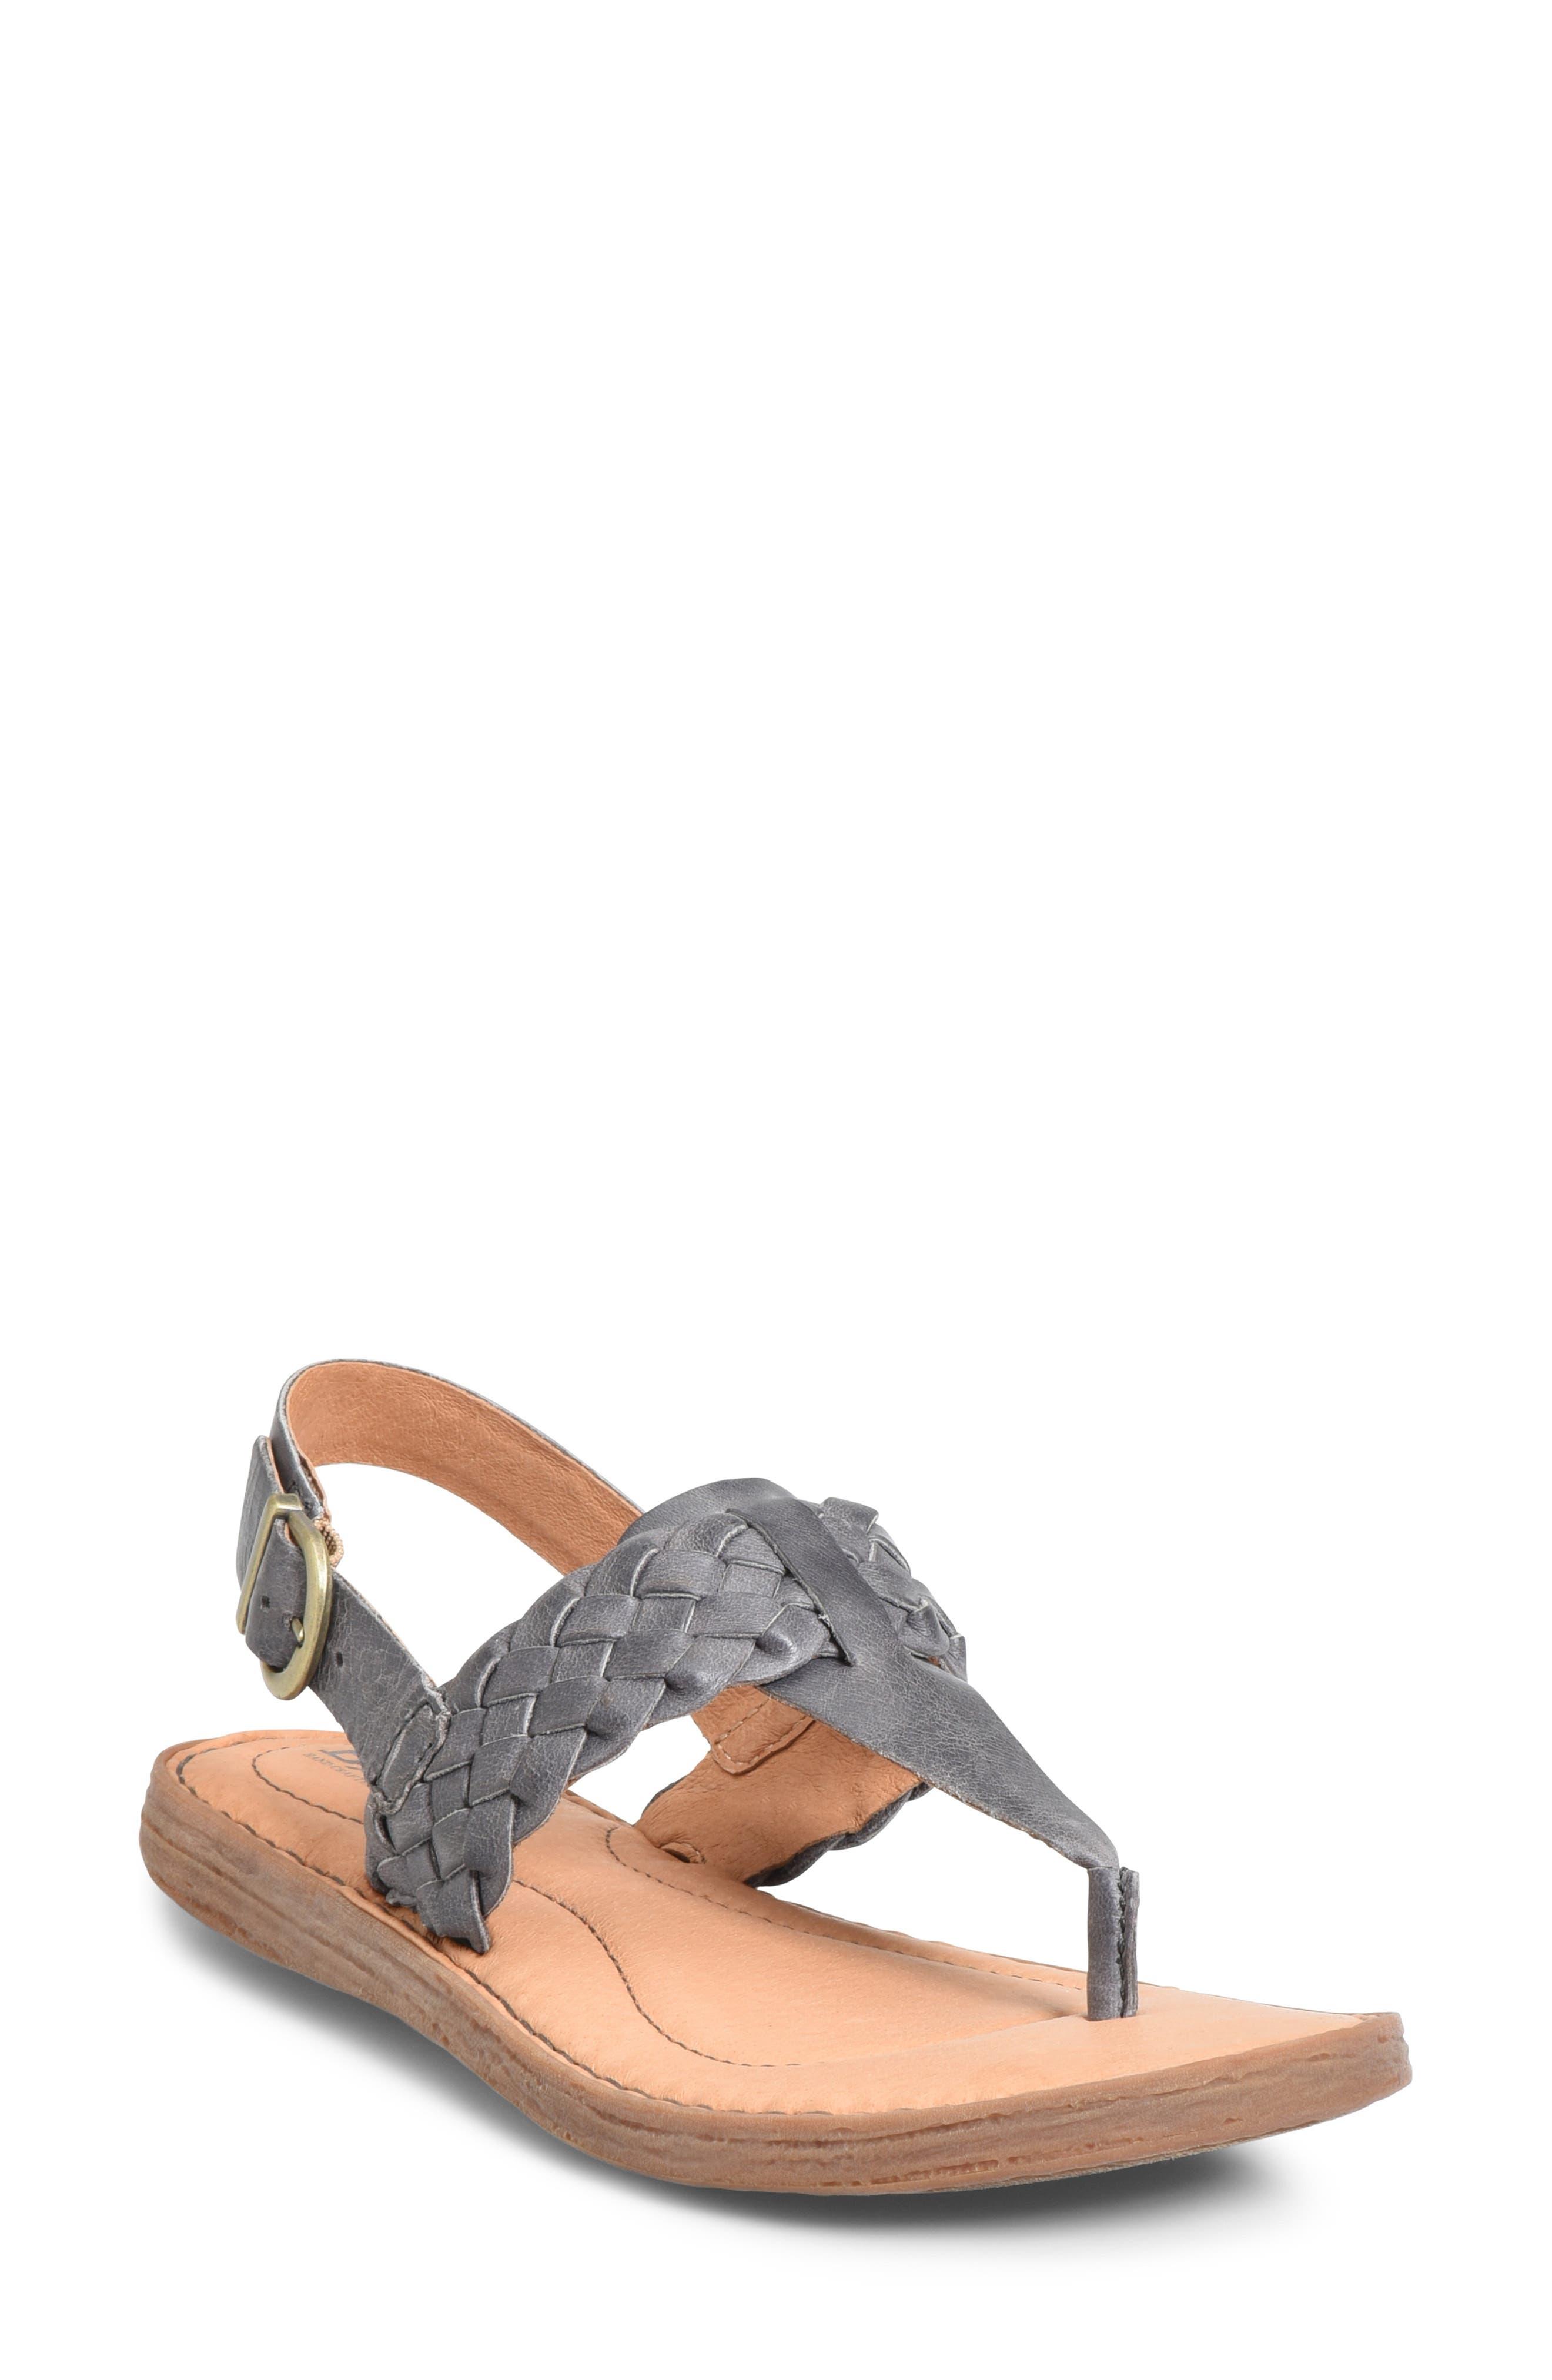 B?rn Sumter Braided Sandal, Grey